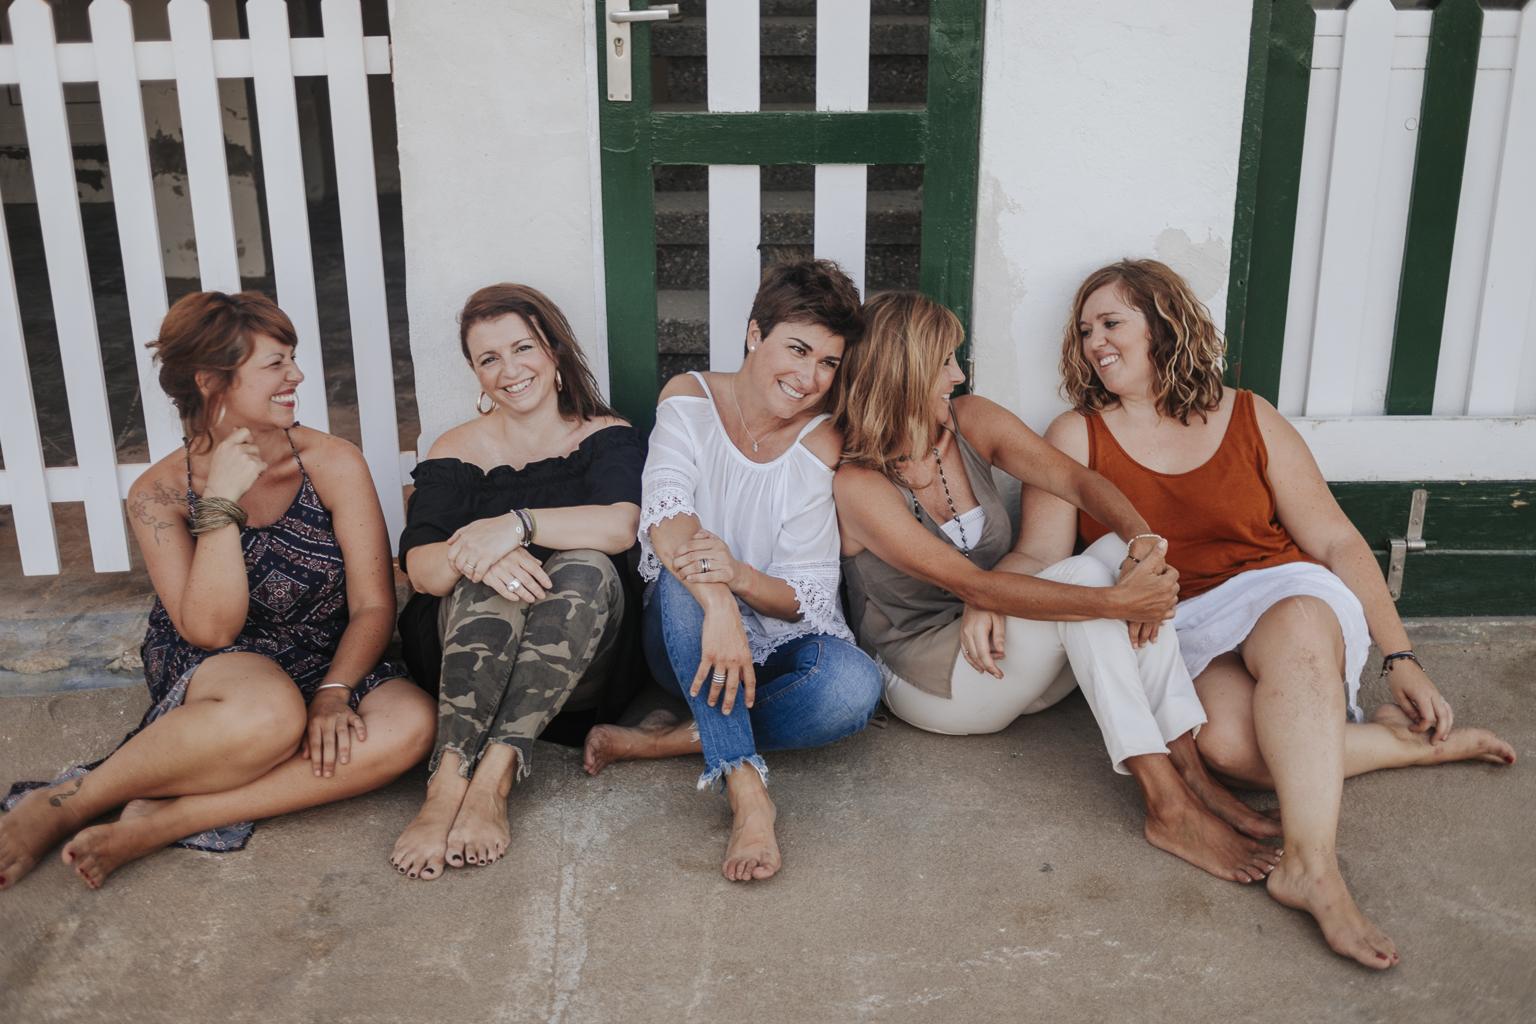 fotógrafo de grupo barcelona :: despedida de soltera barcelona :: fotógrafo de grupo de amigas :: fotógrafo en puerto deportivo :: fotógrafo de amigas :: fotógrafo barcelona